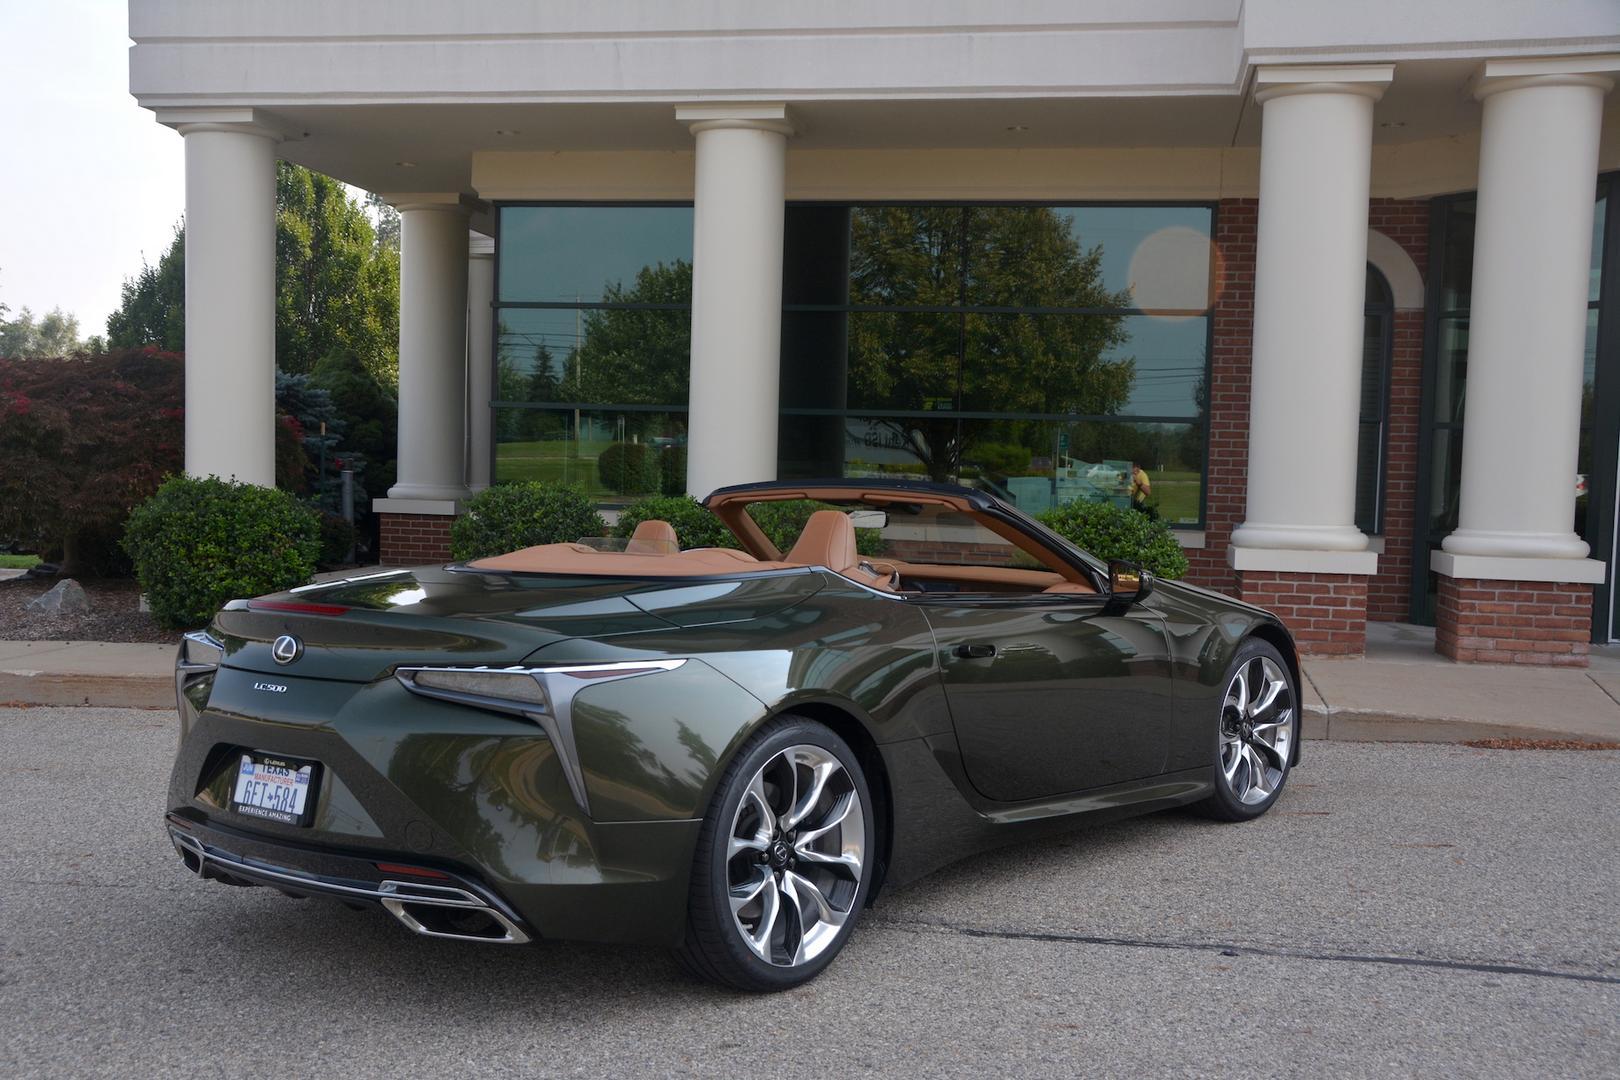 Lexus LC 500 Convertible rear side